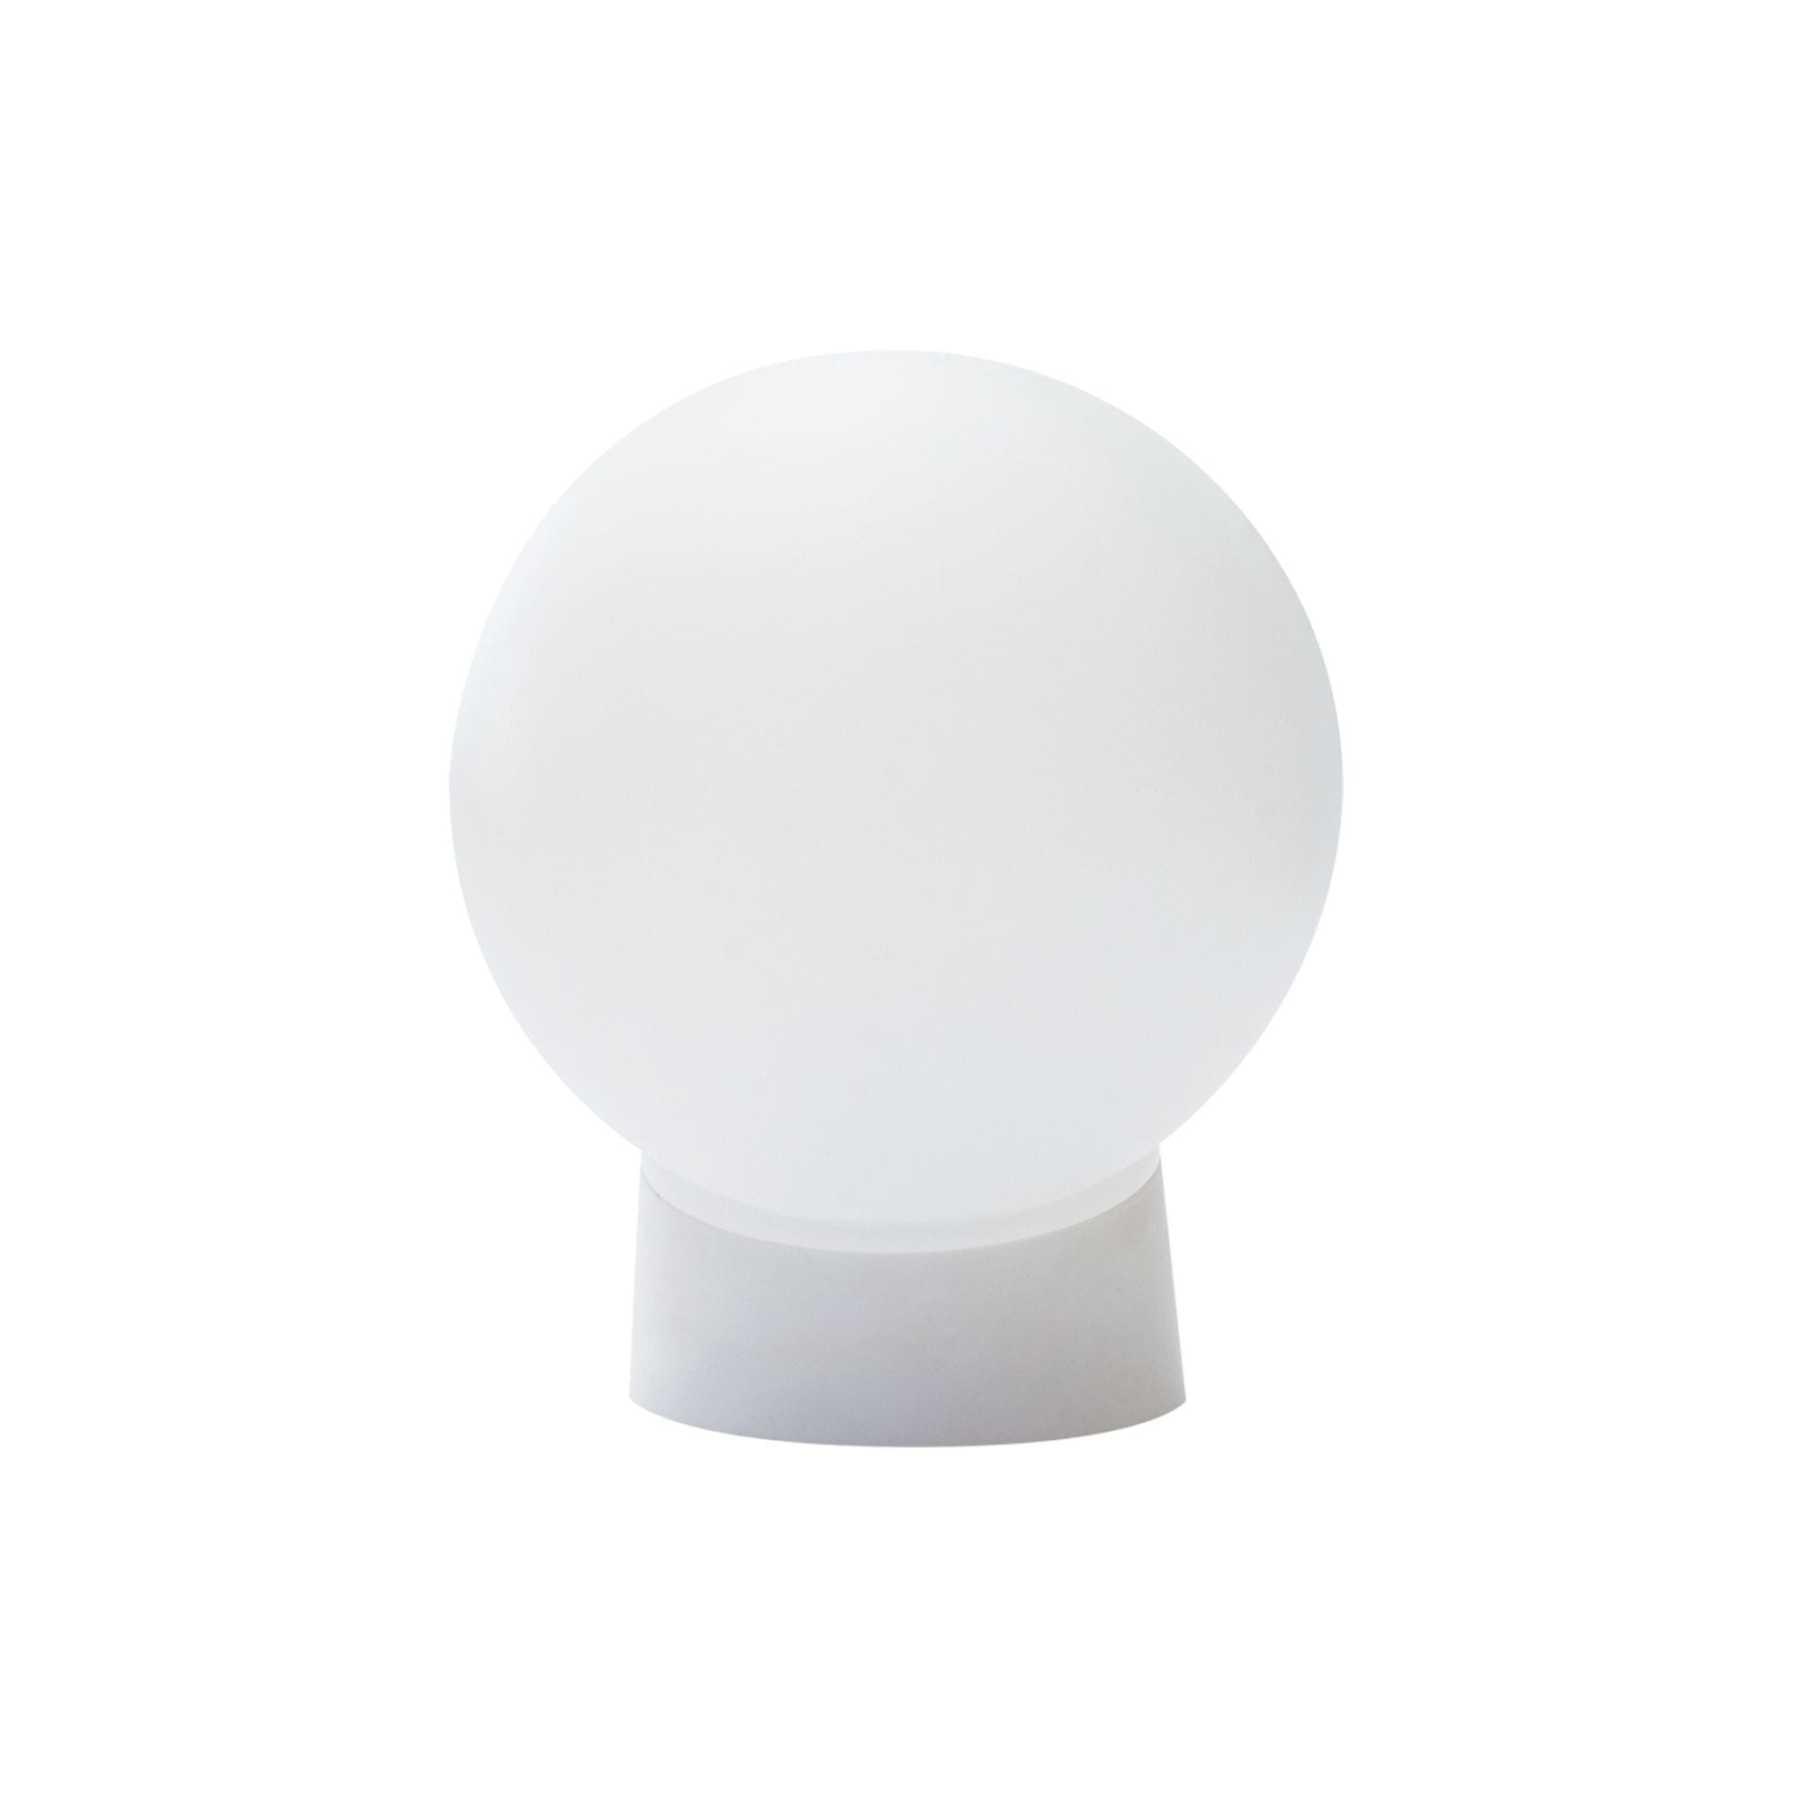 Lamp ball NBA 1 хе27х60 W plastic, color White